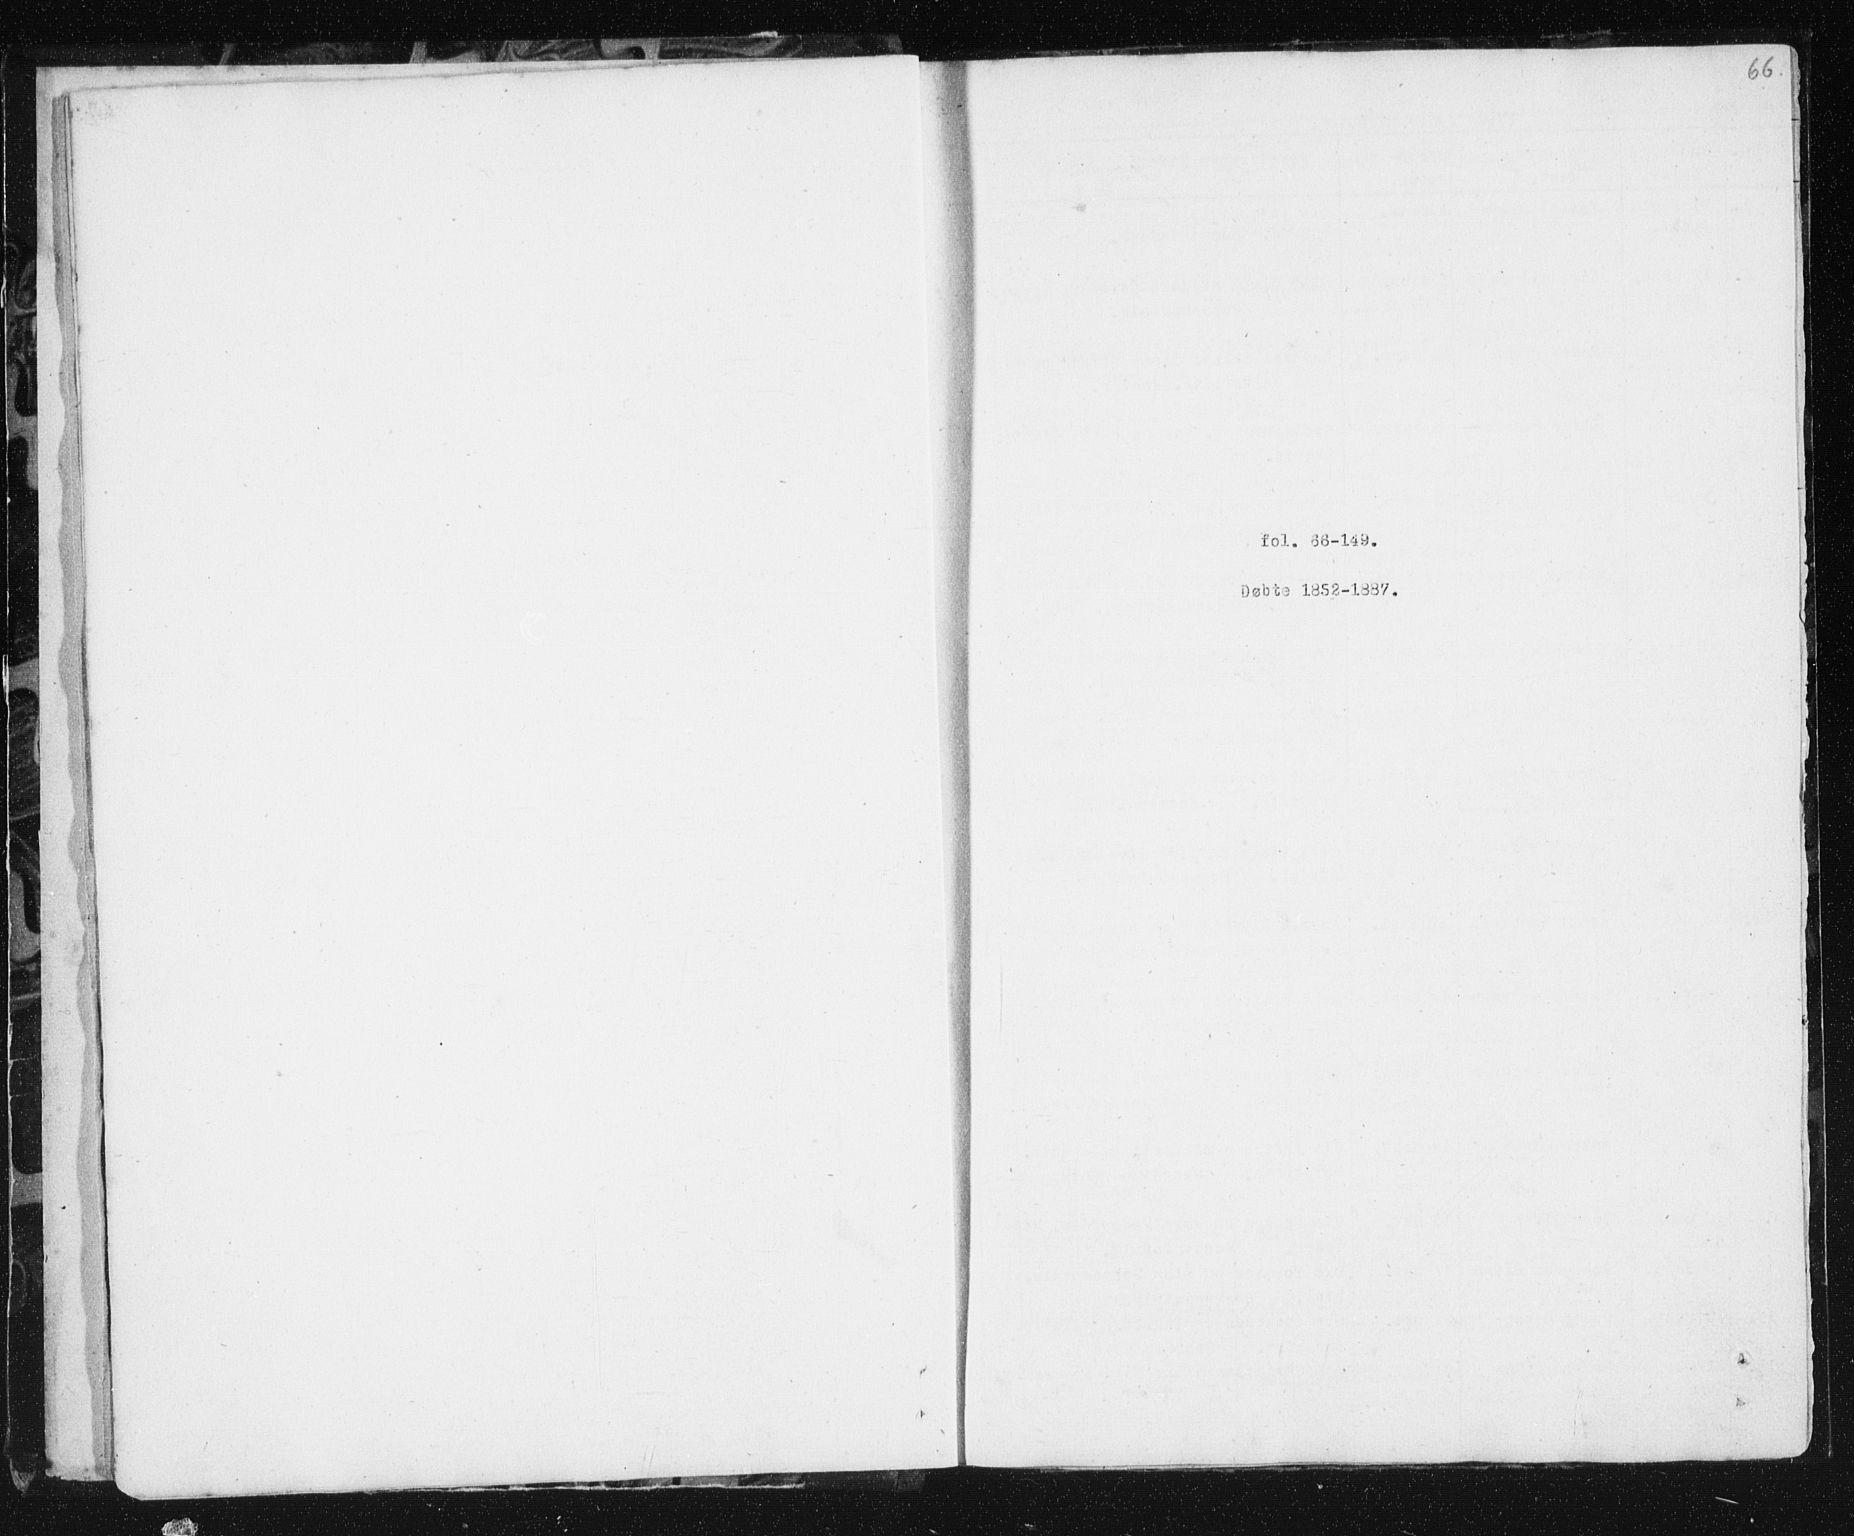 SAT, Ministerialprotokoller, klokkerbøker og fødselsregistre - Sør-Trøndelag, 692/L1110: Parish register (copy) no. 692C05, 1849-1889, p. 66